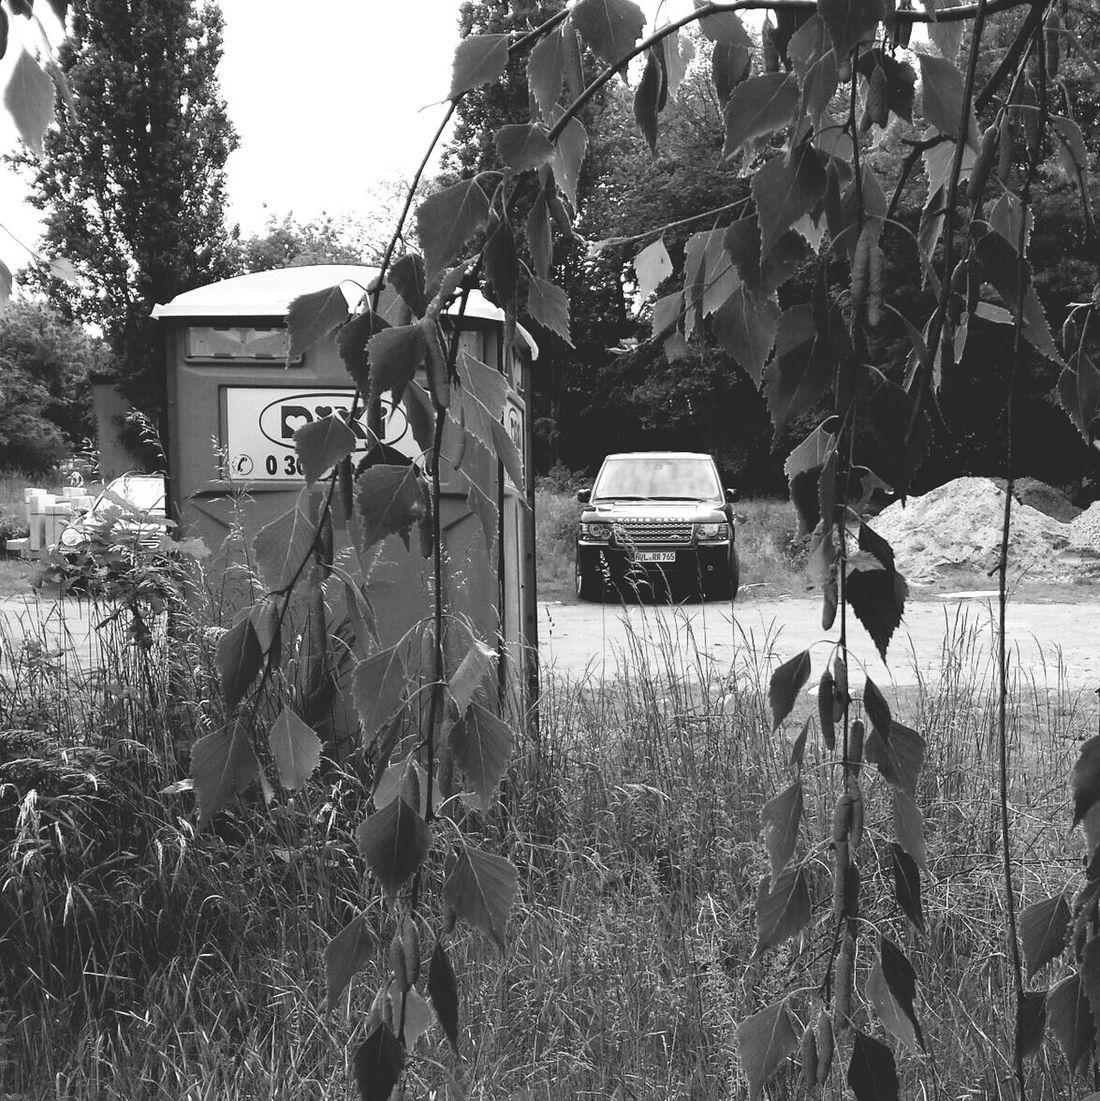 Blackandwhite Streetphotography Berlin